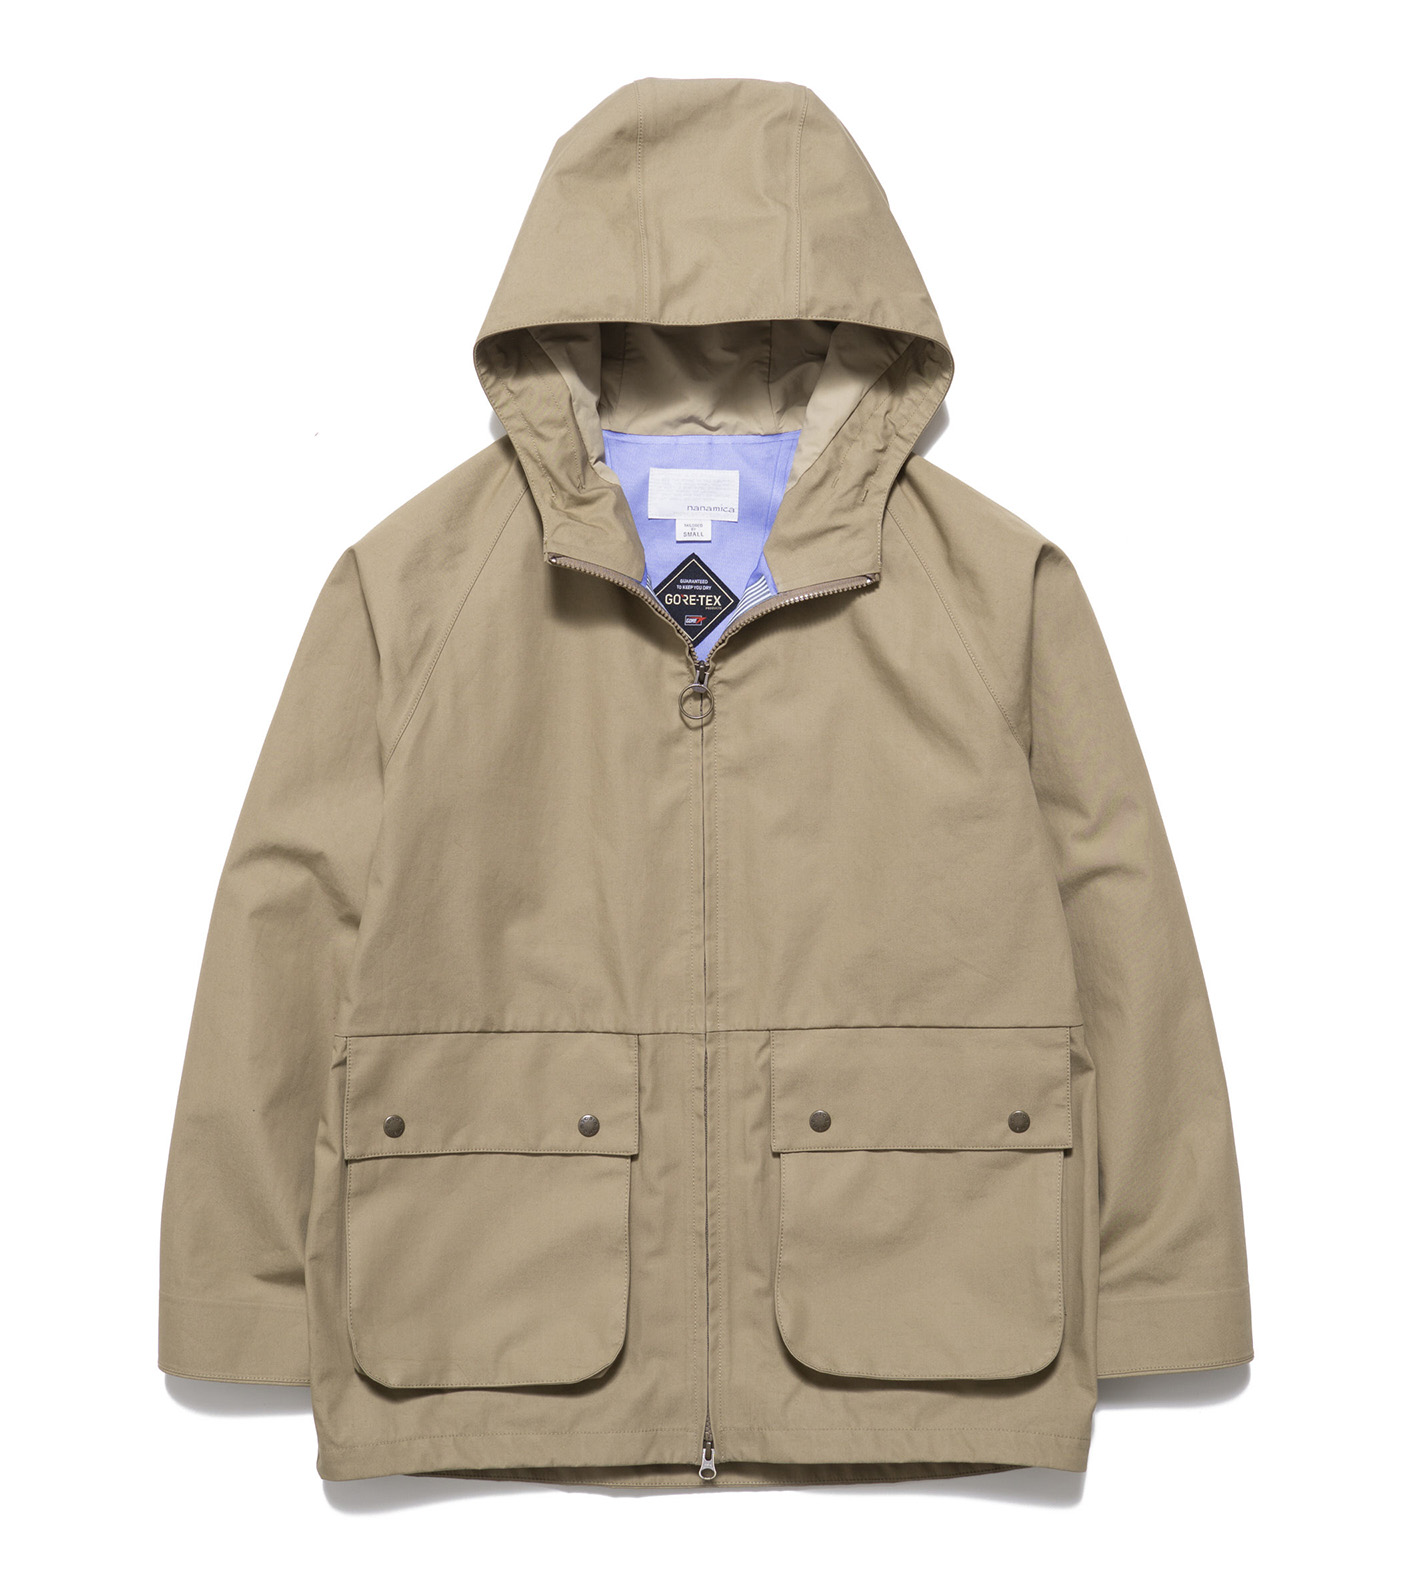 nanamica / GORE-TEX Cruiser Jacket